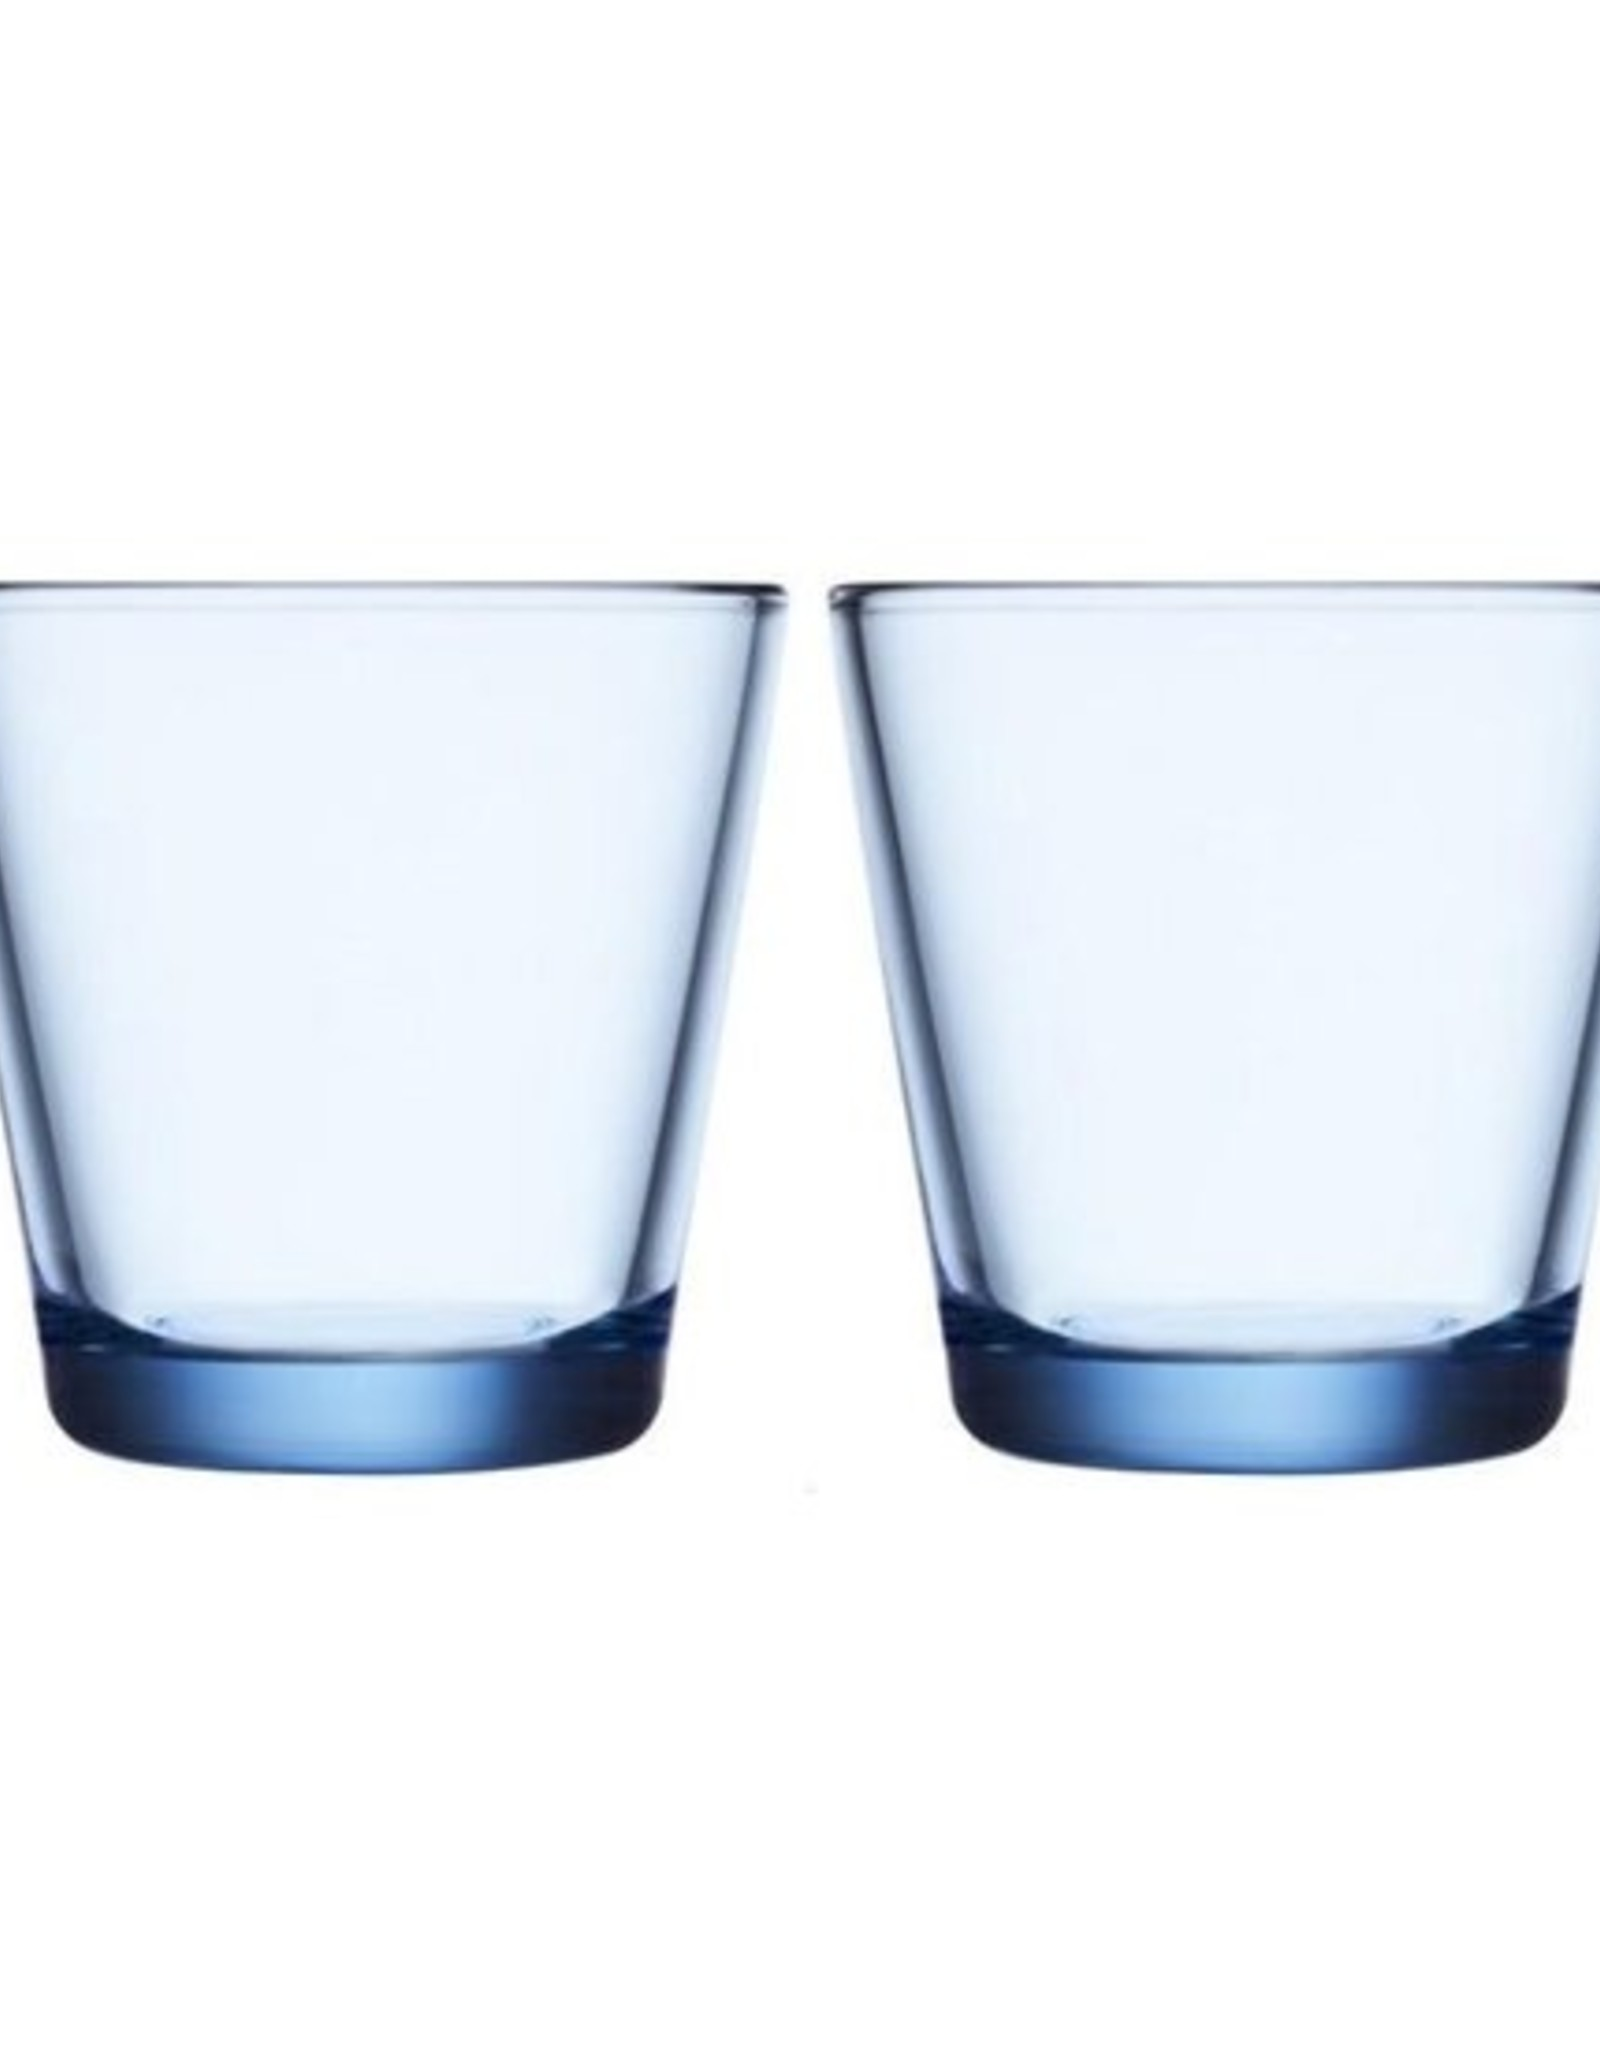 Iittala Iittala Kartio Glas - 21 cl - Aqua - 2 stuks